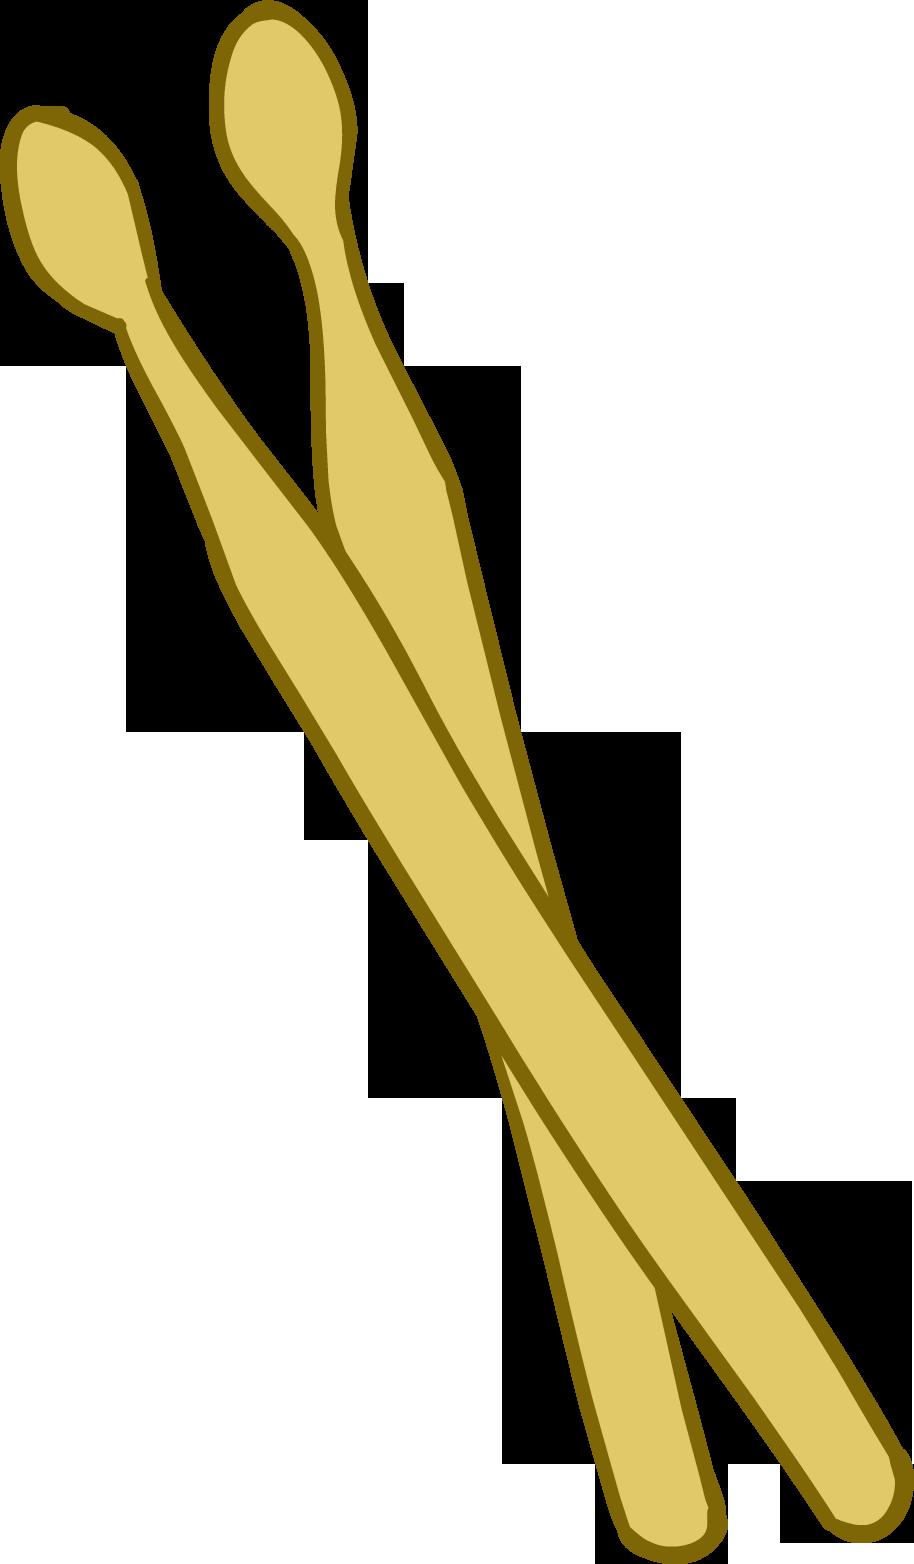 Animal's Drum Sticks